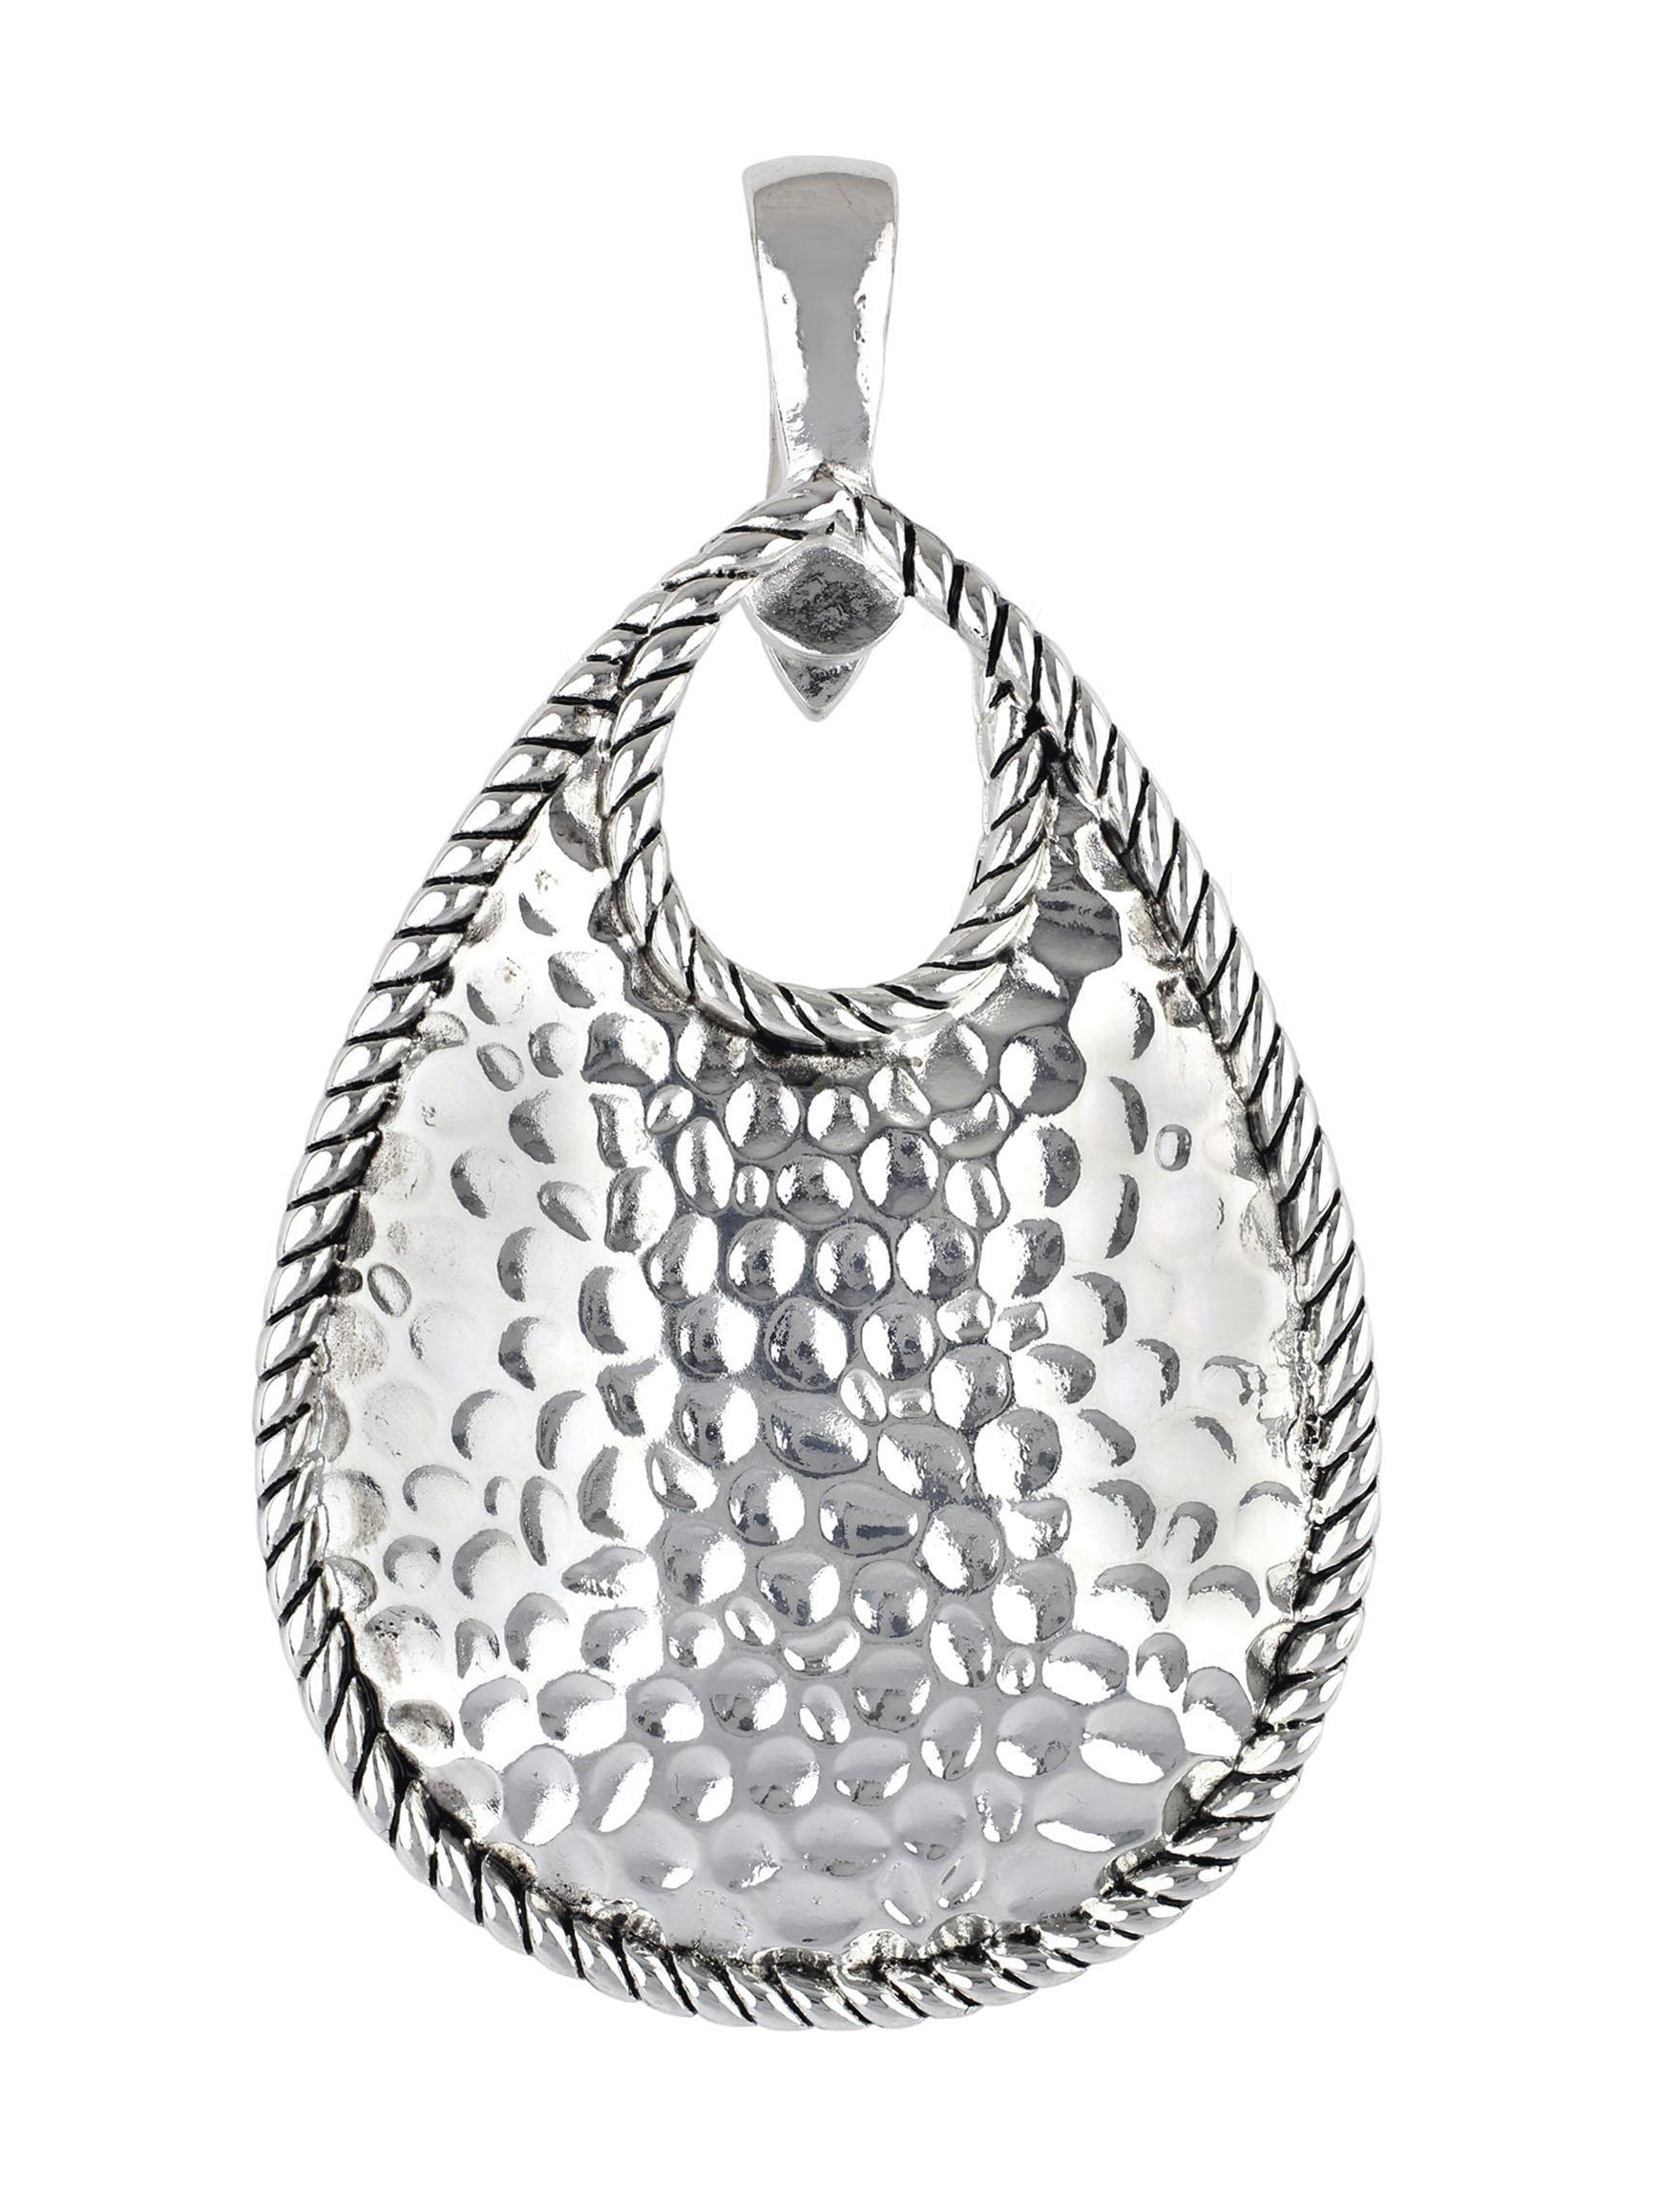 Wearable Art White Necklaces & Pendants Fashion Jewelry